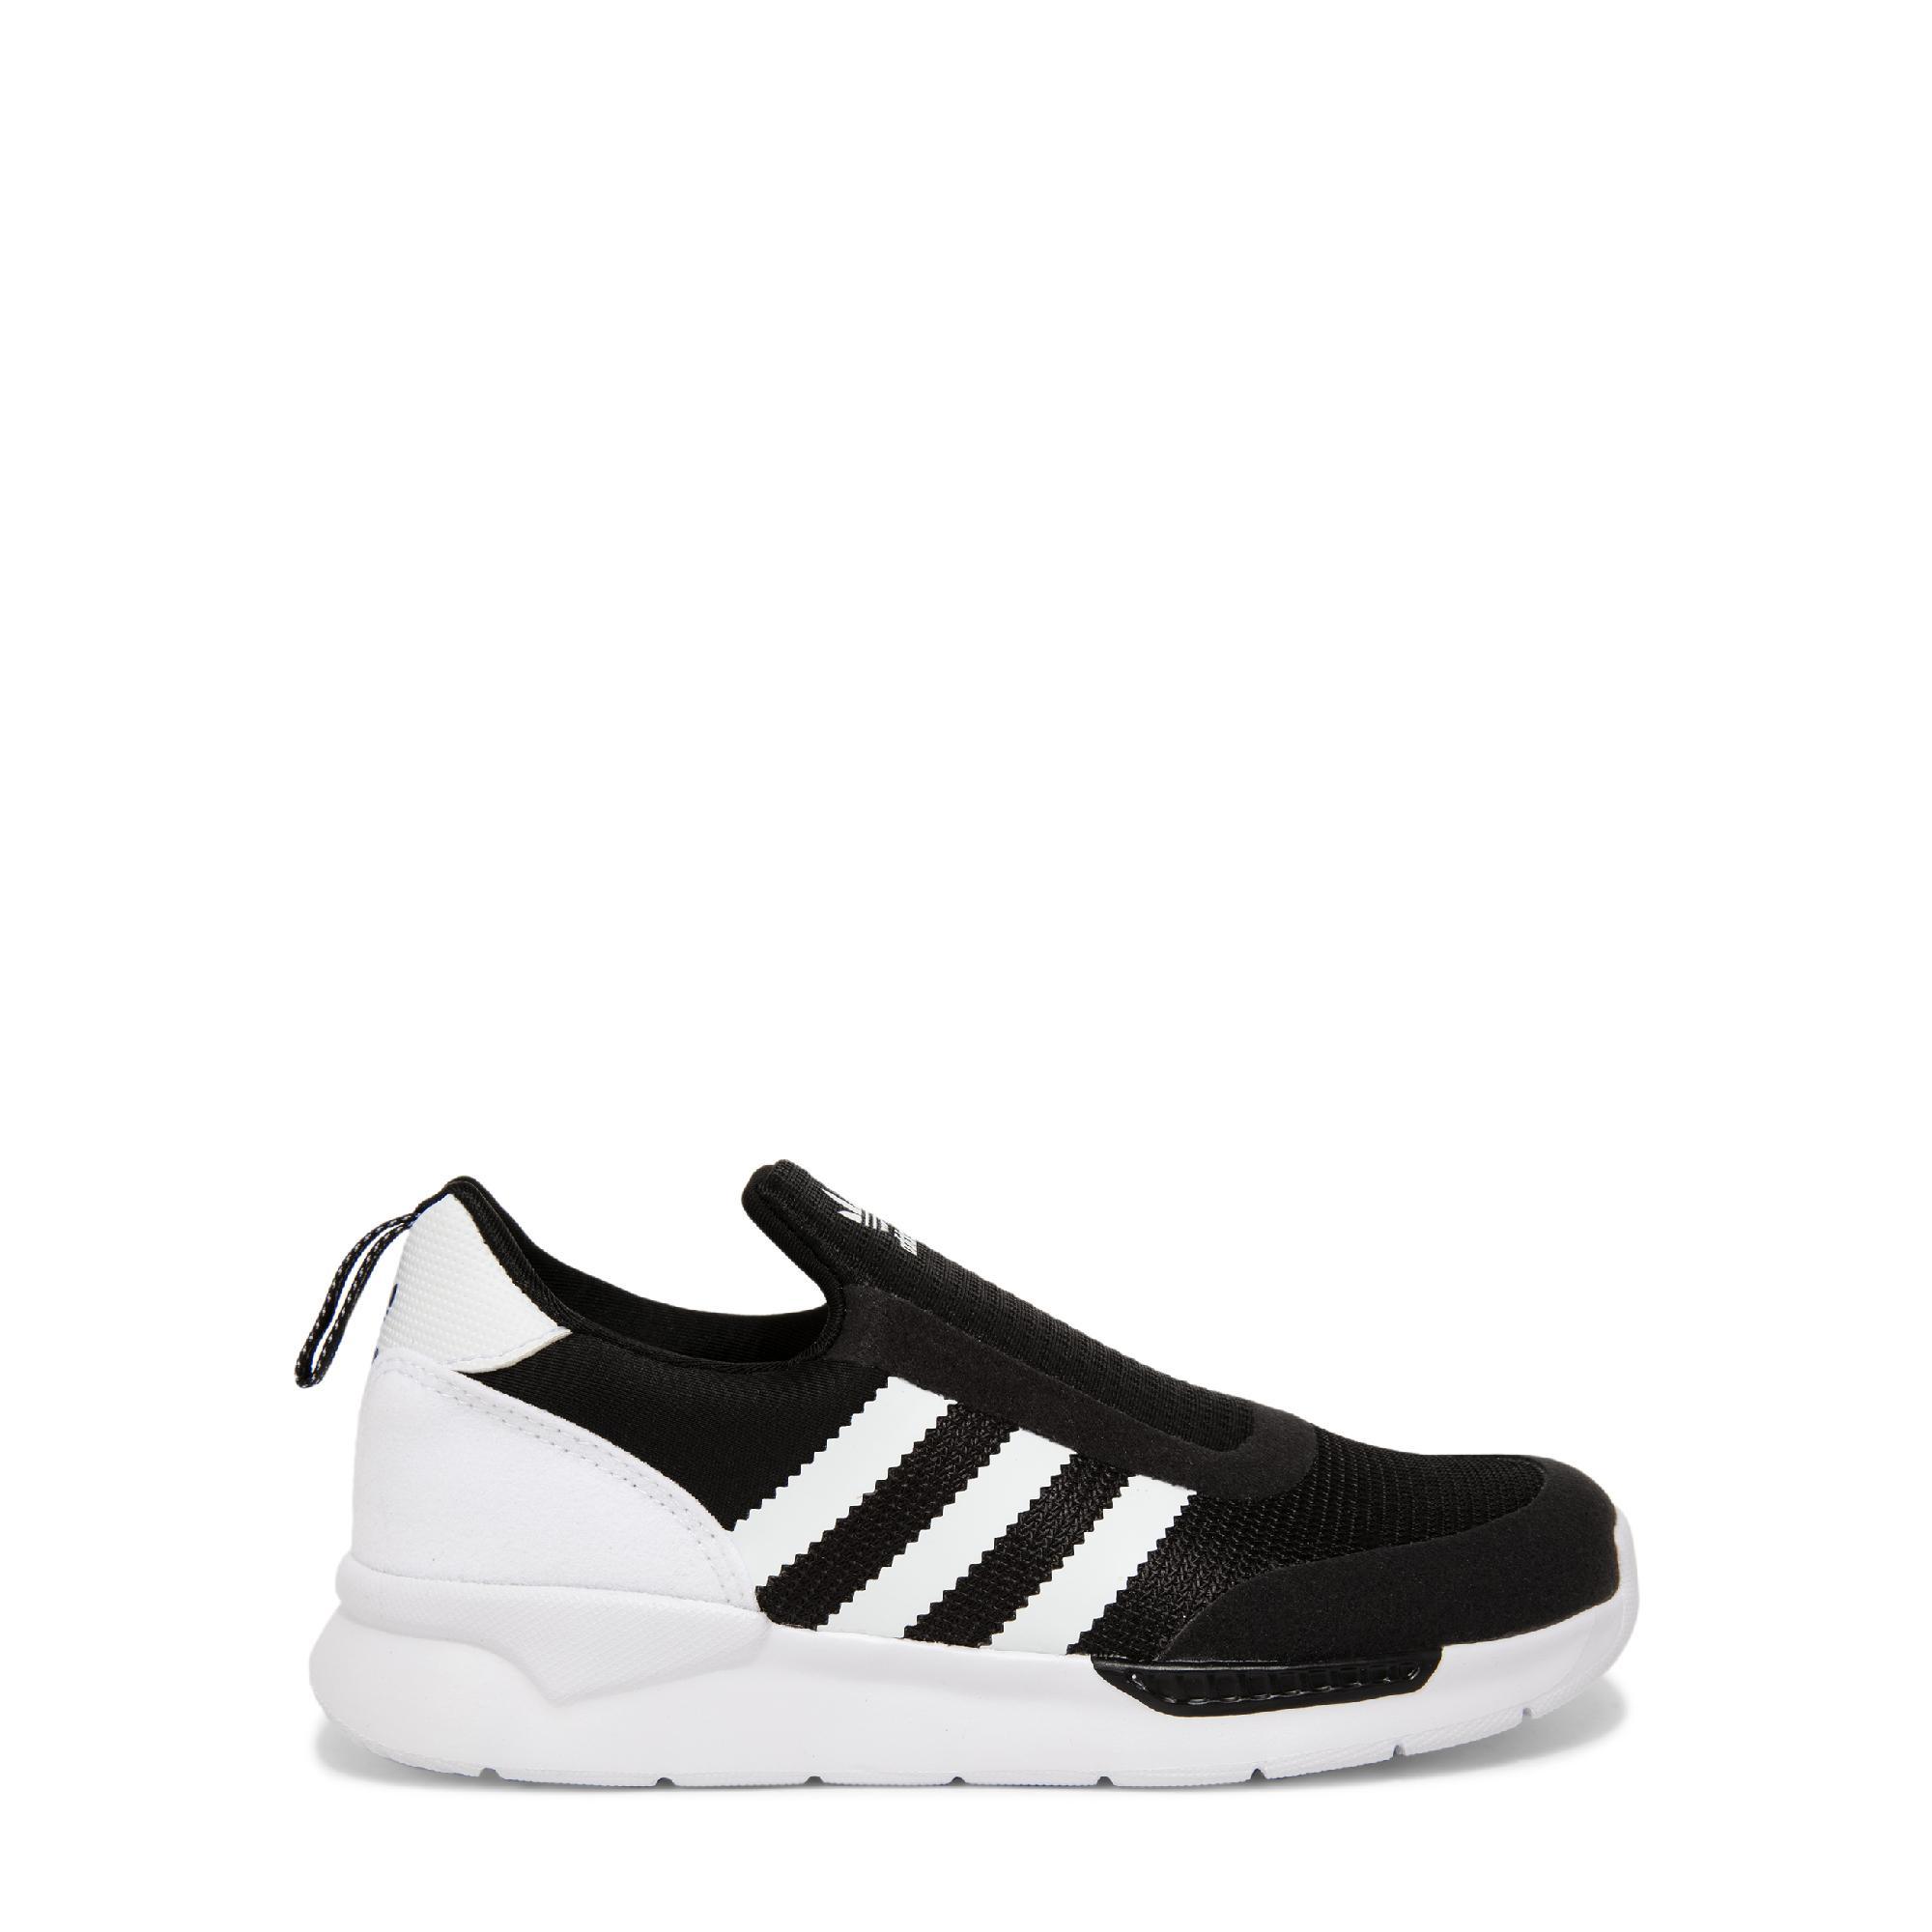 ZX 360 sneakers